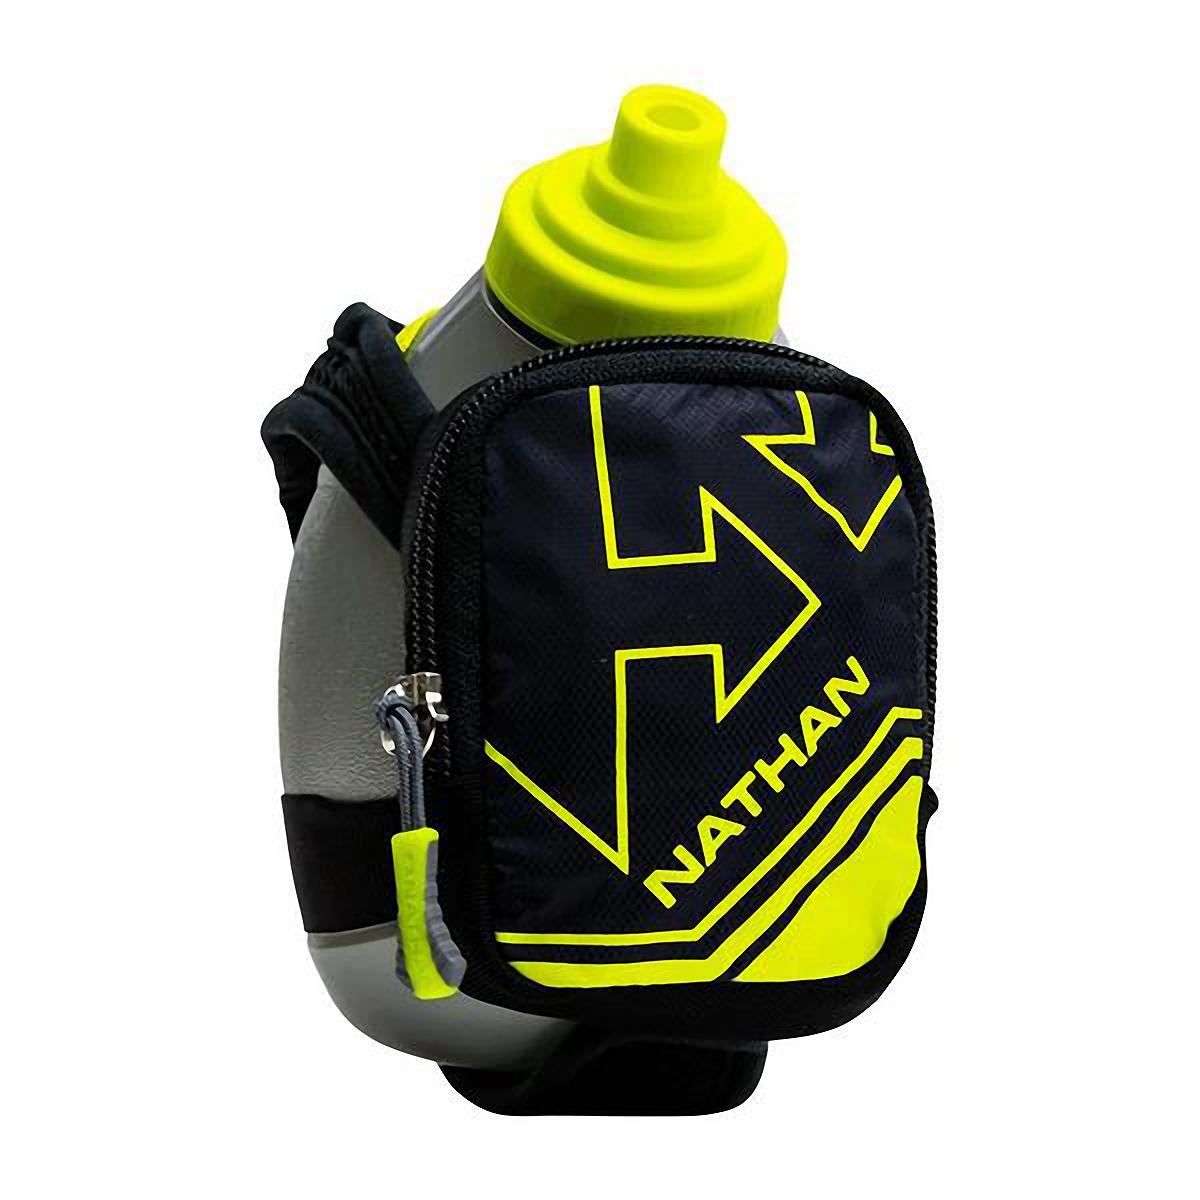 Nathan Quickshot Plus Hydration Flask - Color: Black - Size: One Size, Black, large, image 1